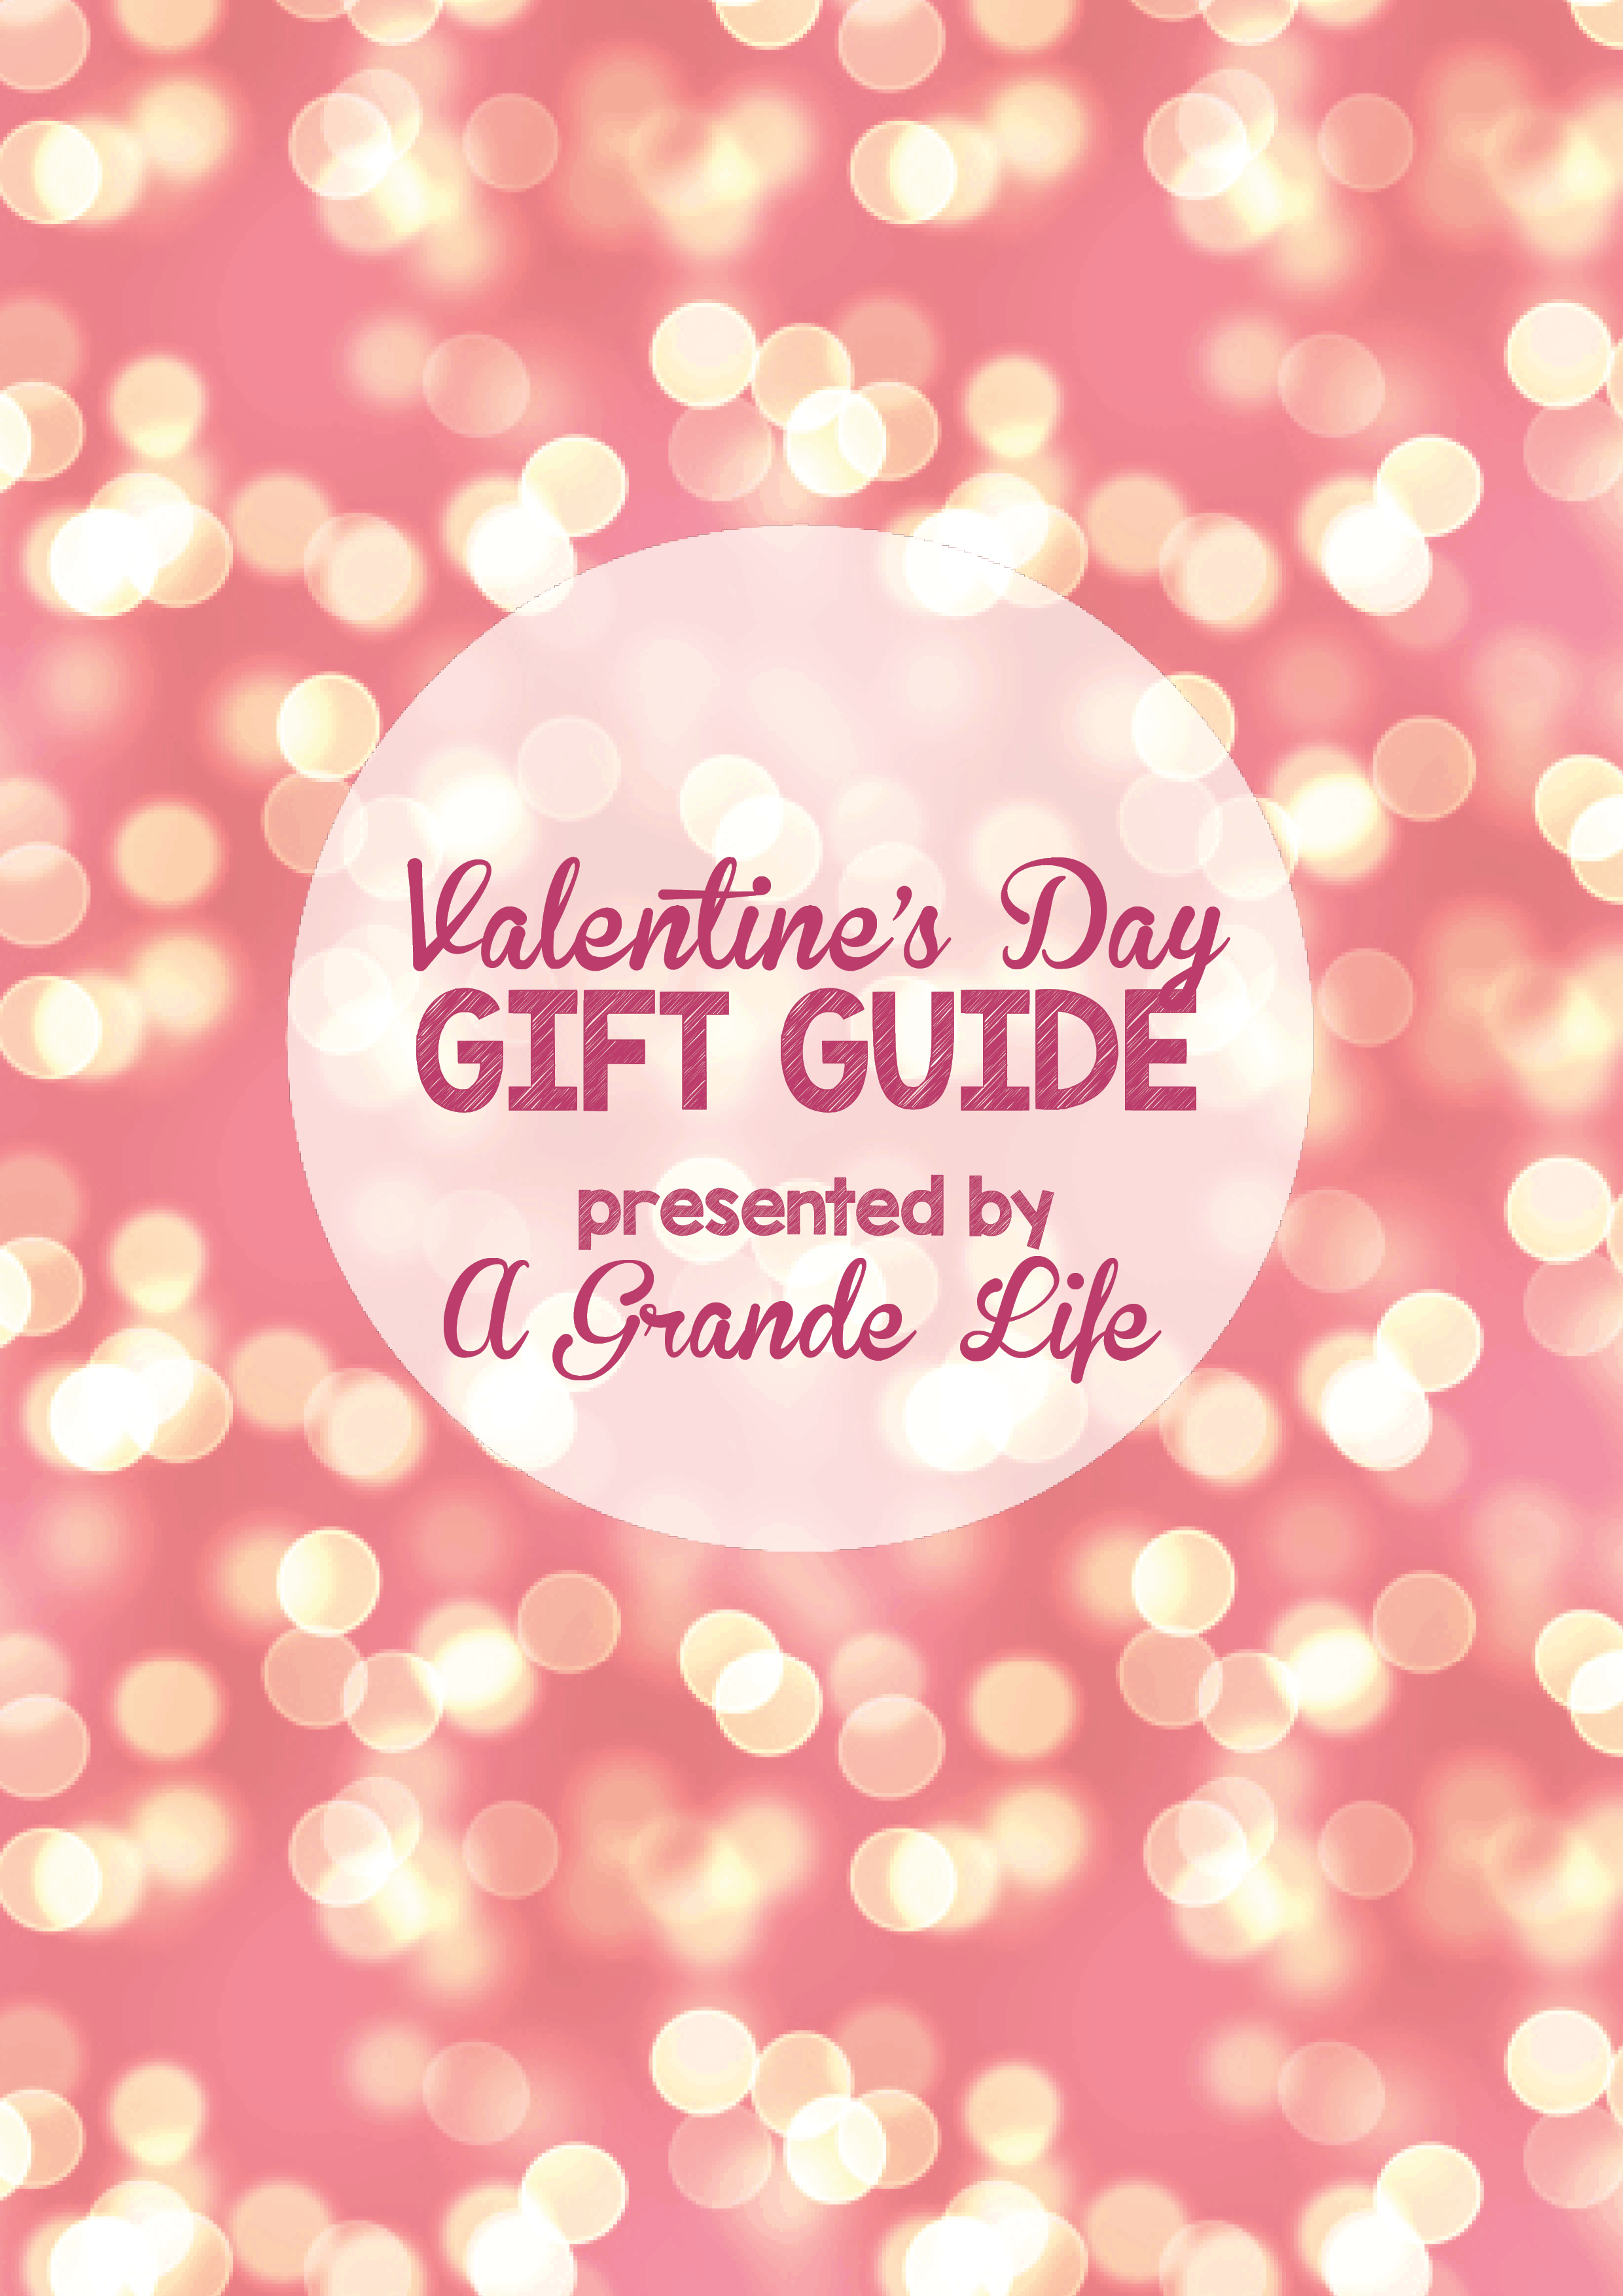 The 2015 shebrand valentine's day gift guide shebrand.